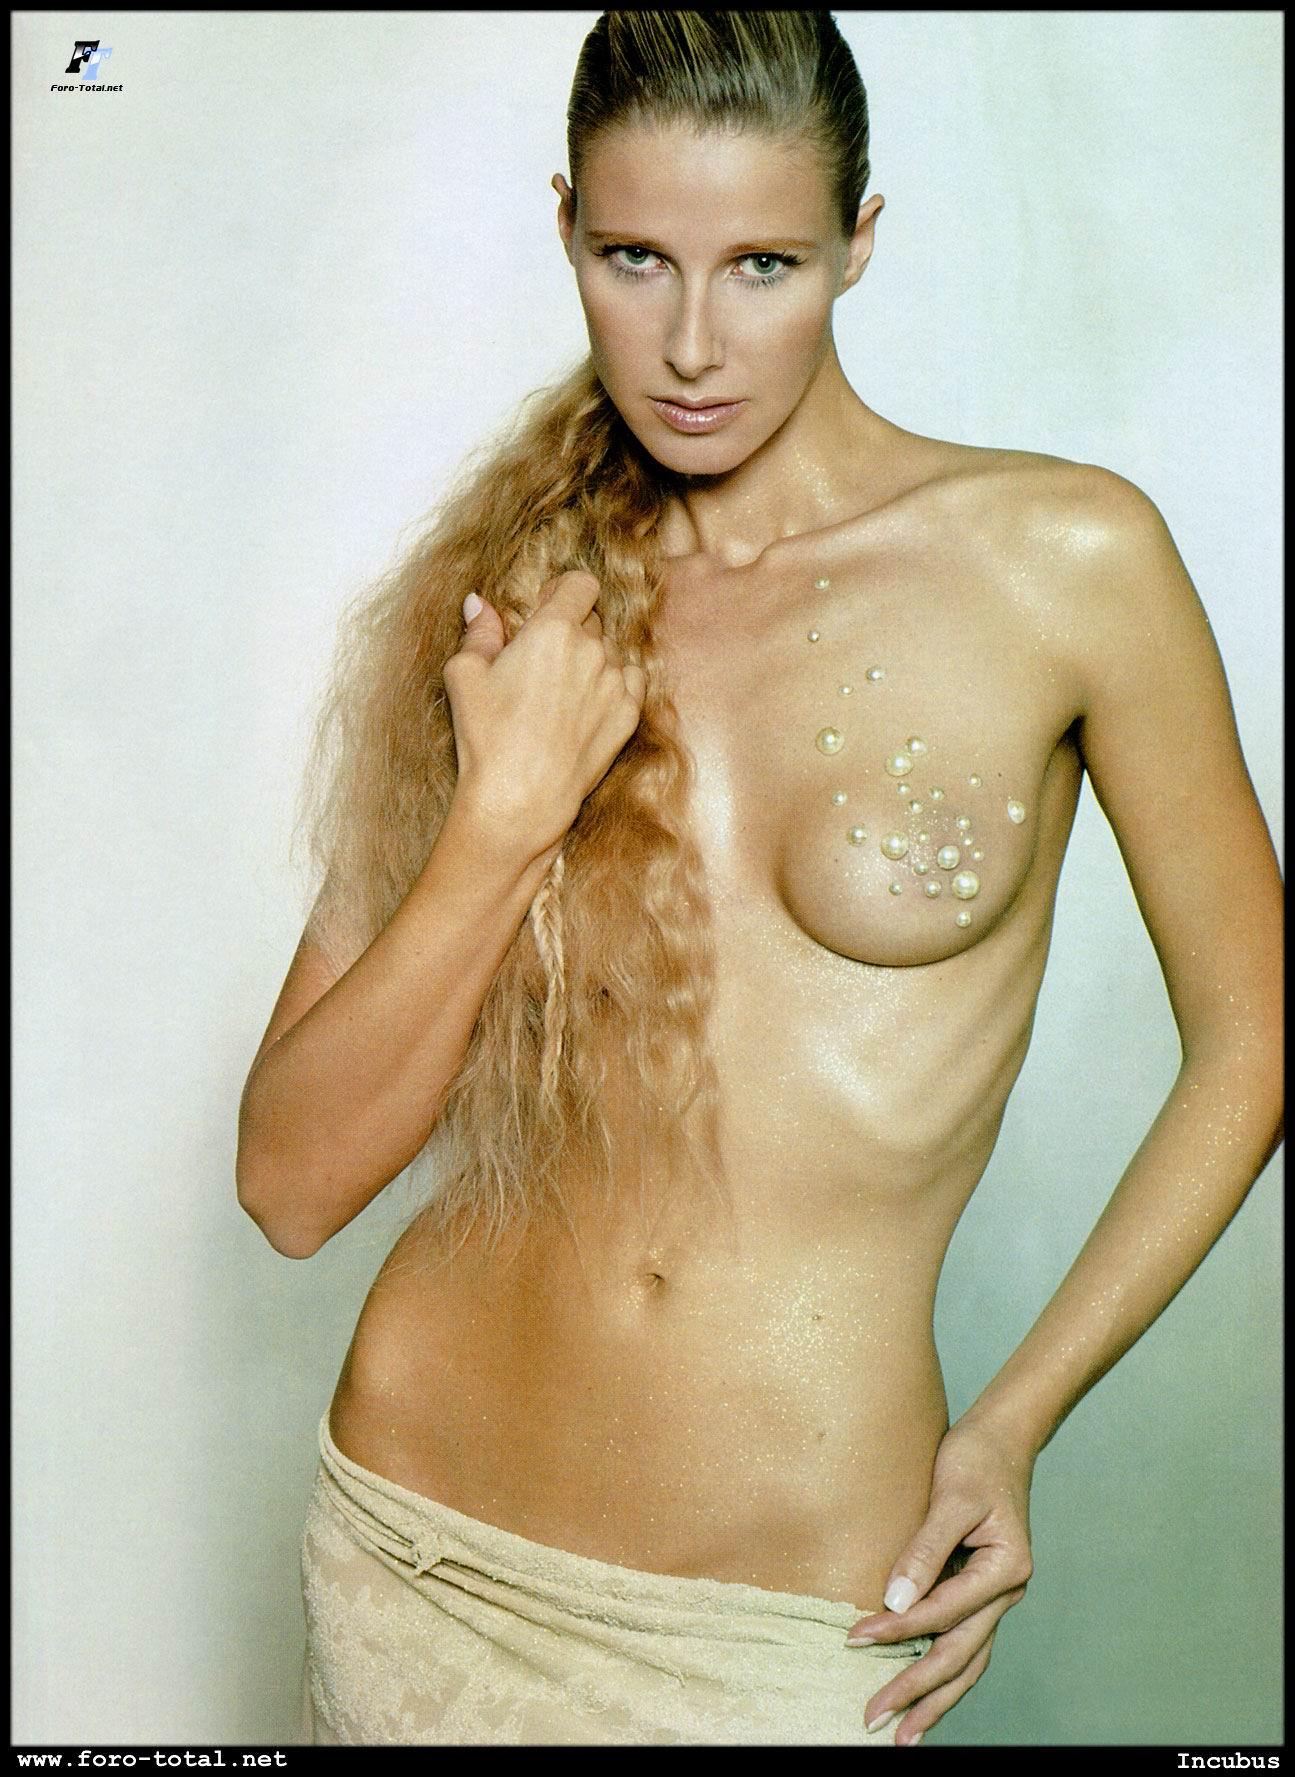 Anne Igartiburu Desnuda Página 15 Fotos Desnuda Descuido Topless